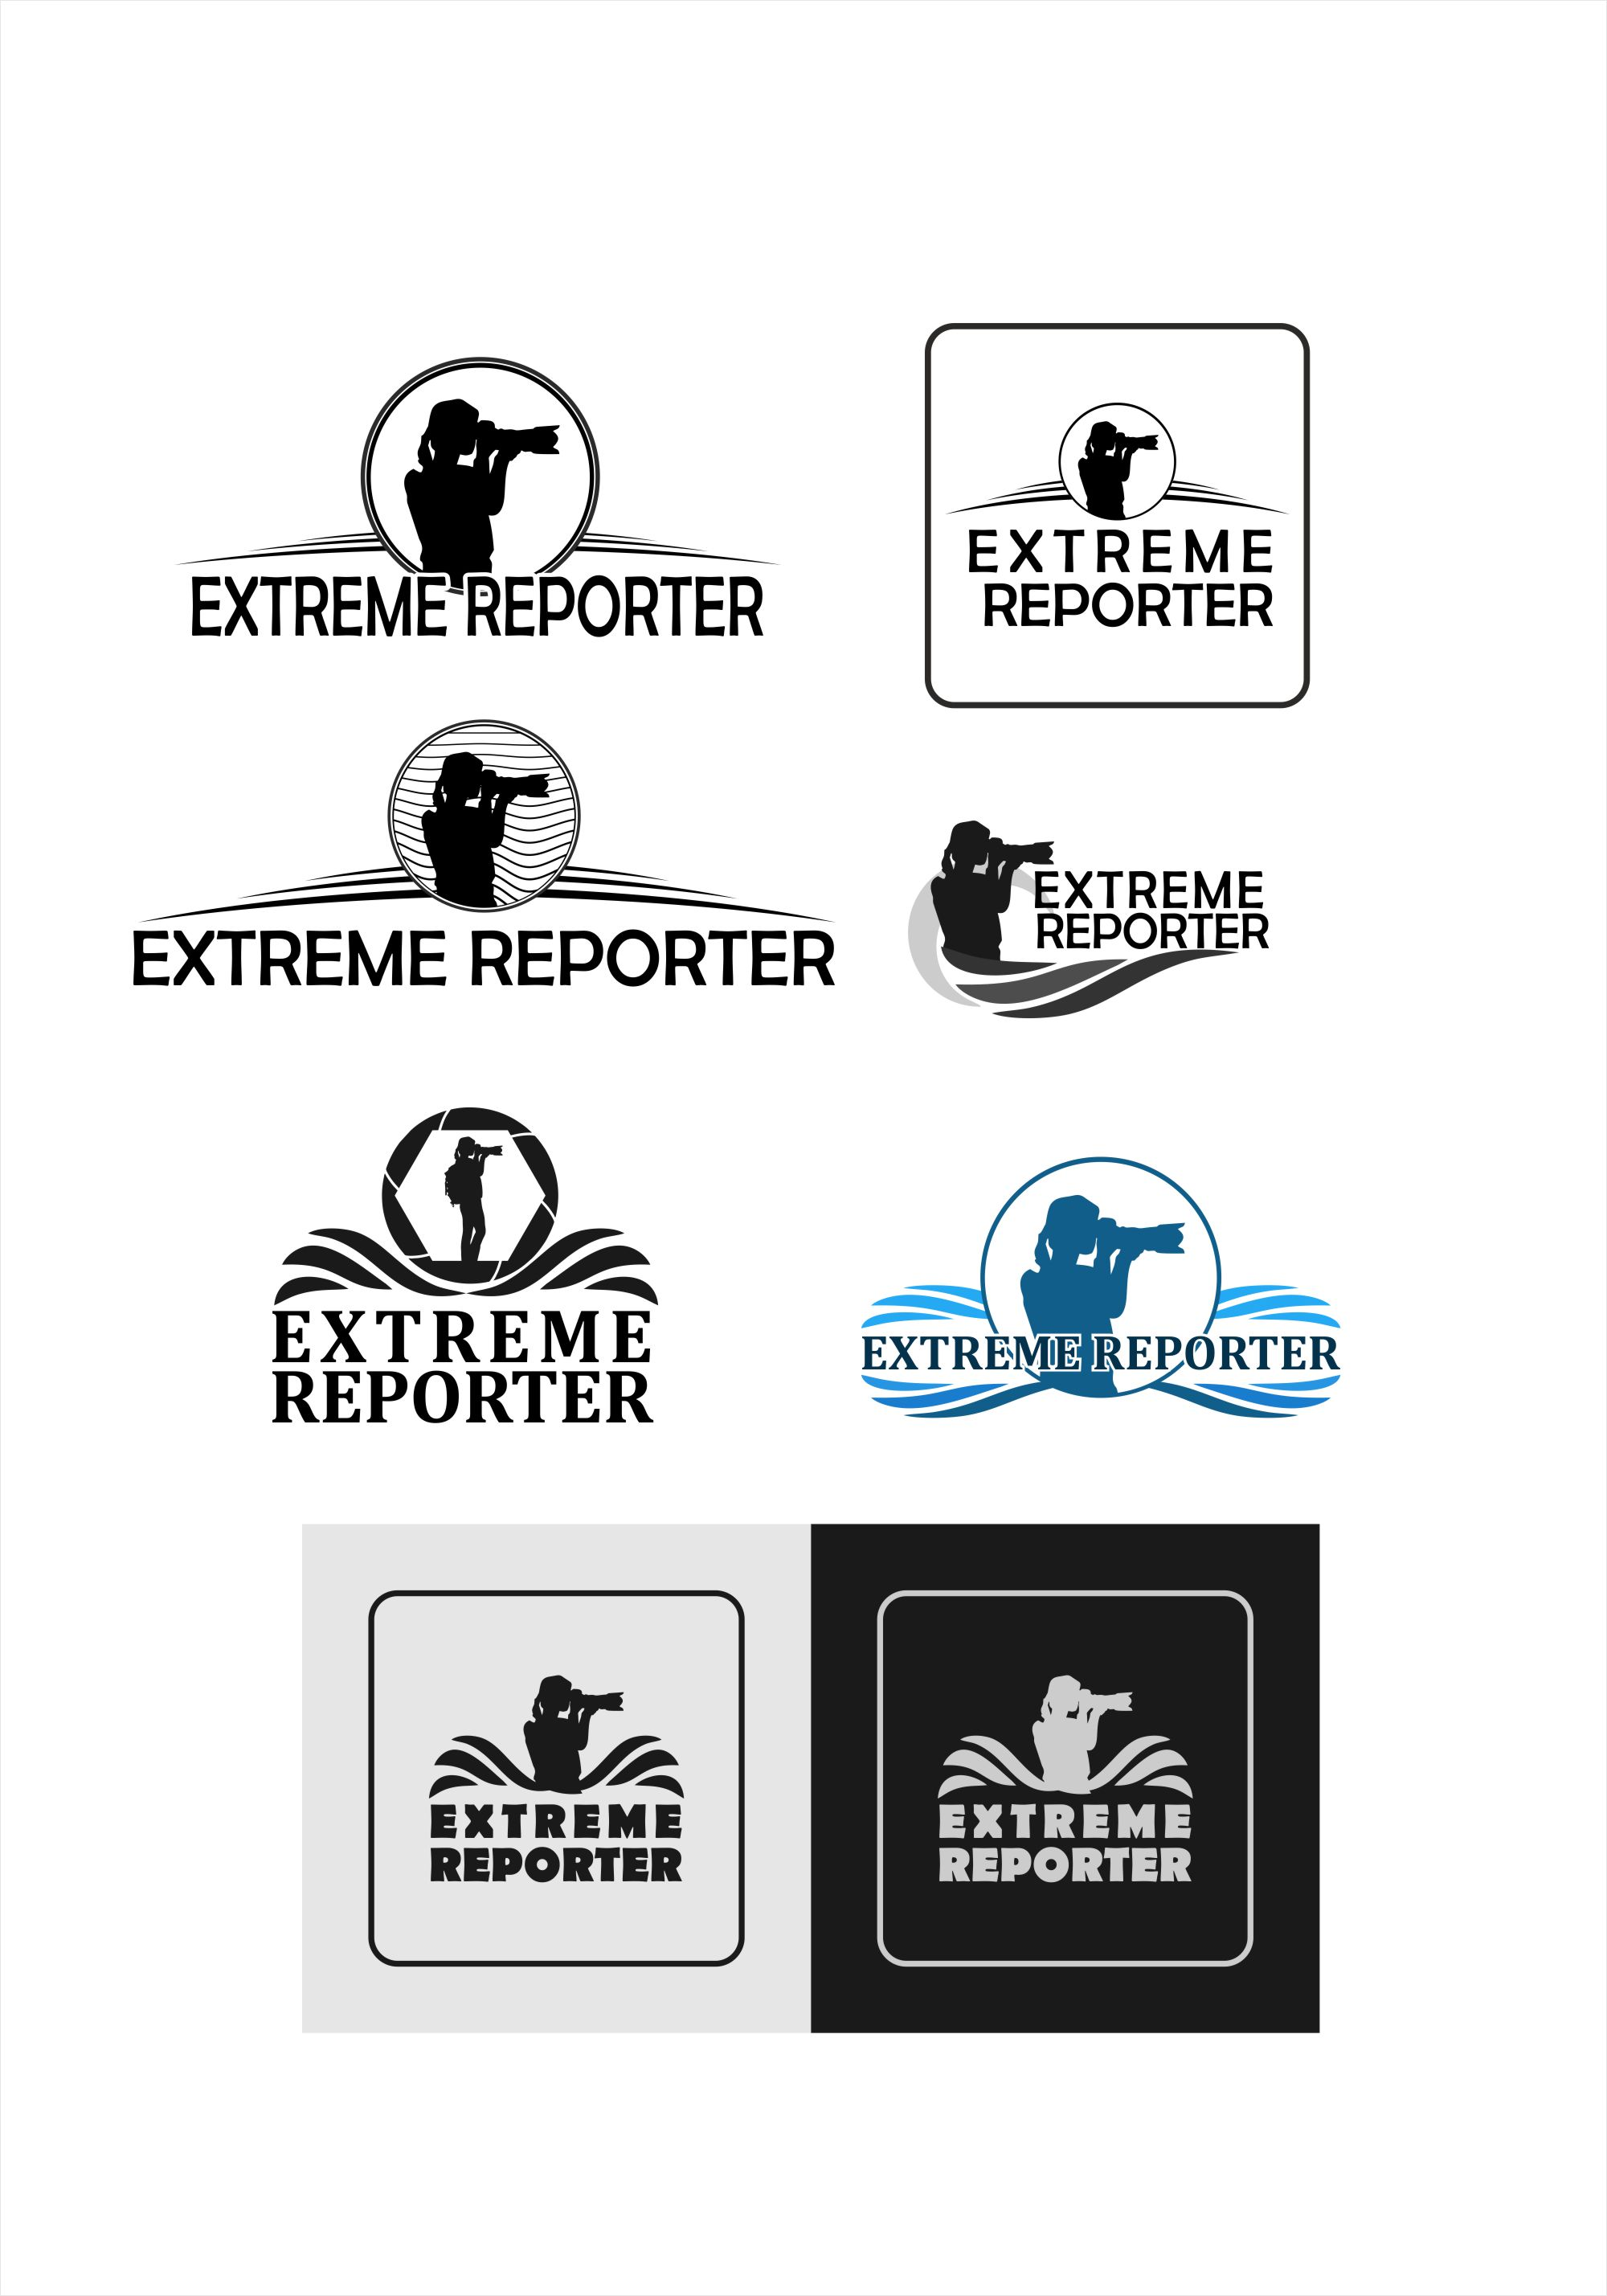 Логотип для экстрим фотографа.  фото f_4005a54b5b81f9b6.jpg